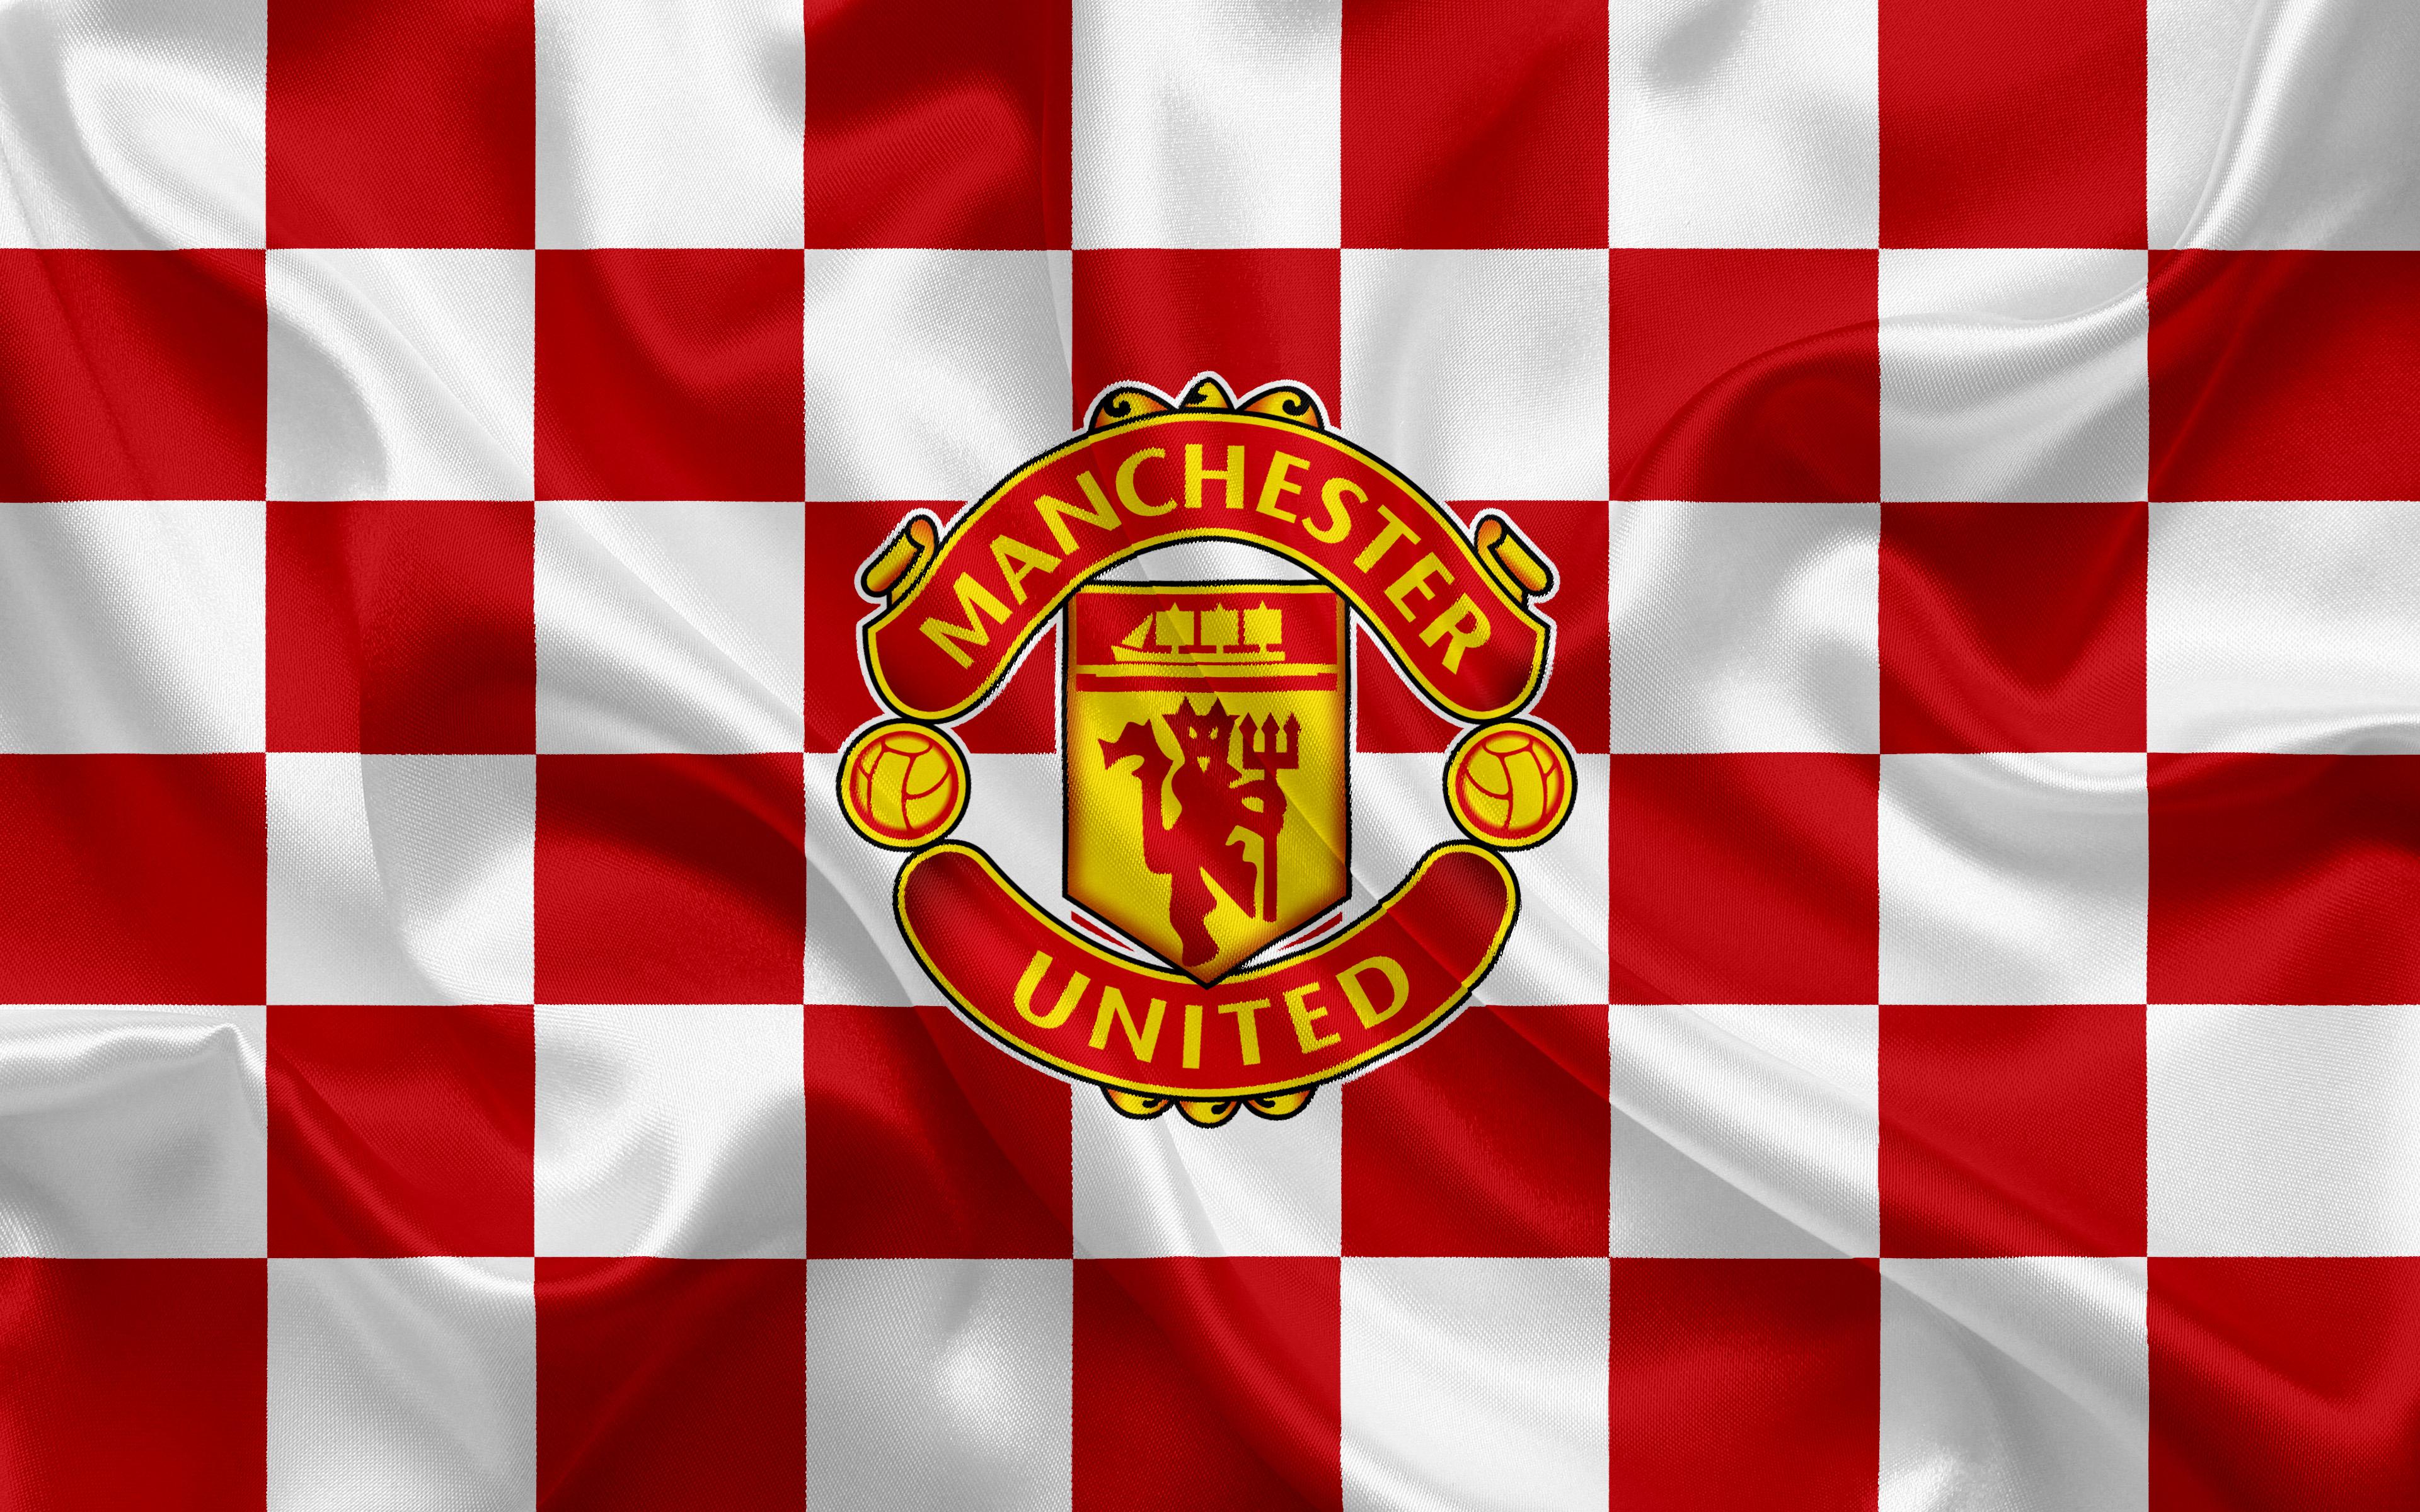 969523 Title Manchester United Logo Sports Manchester Arsenal Logo 3840x2400 Download Hd Wallpaper Wallpapertip